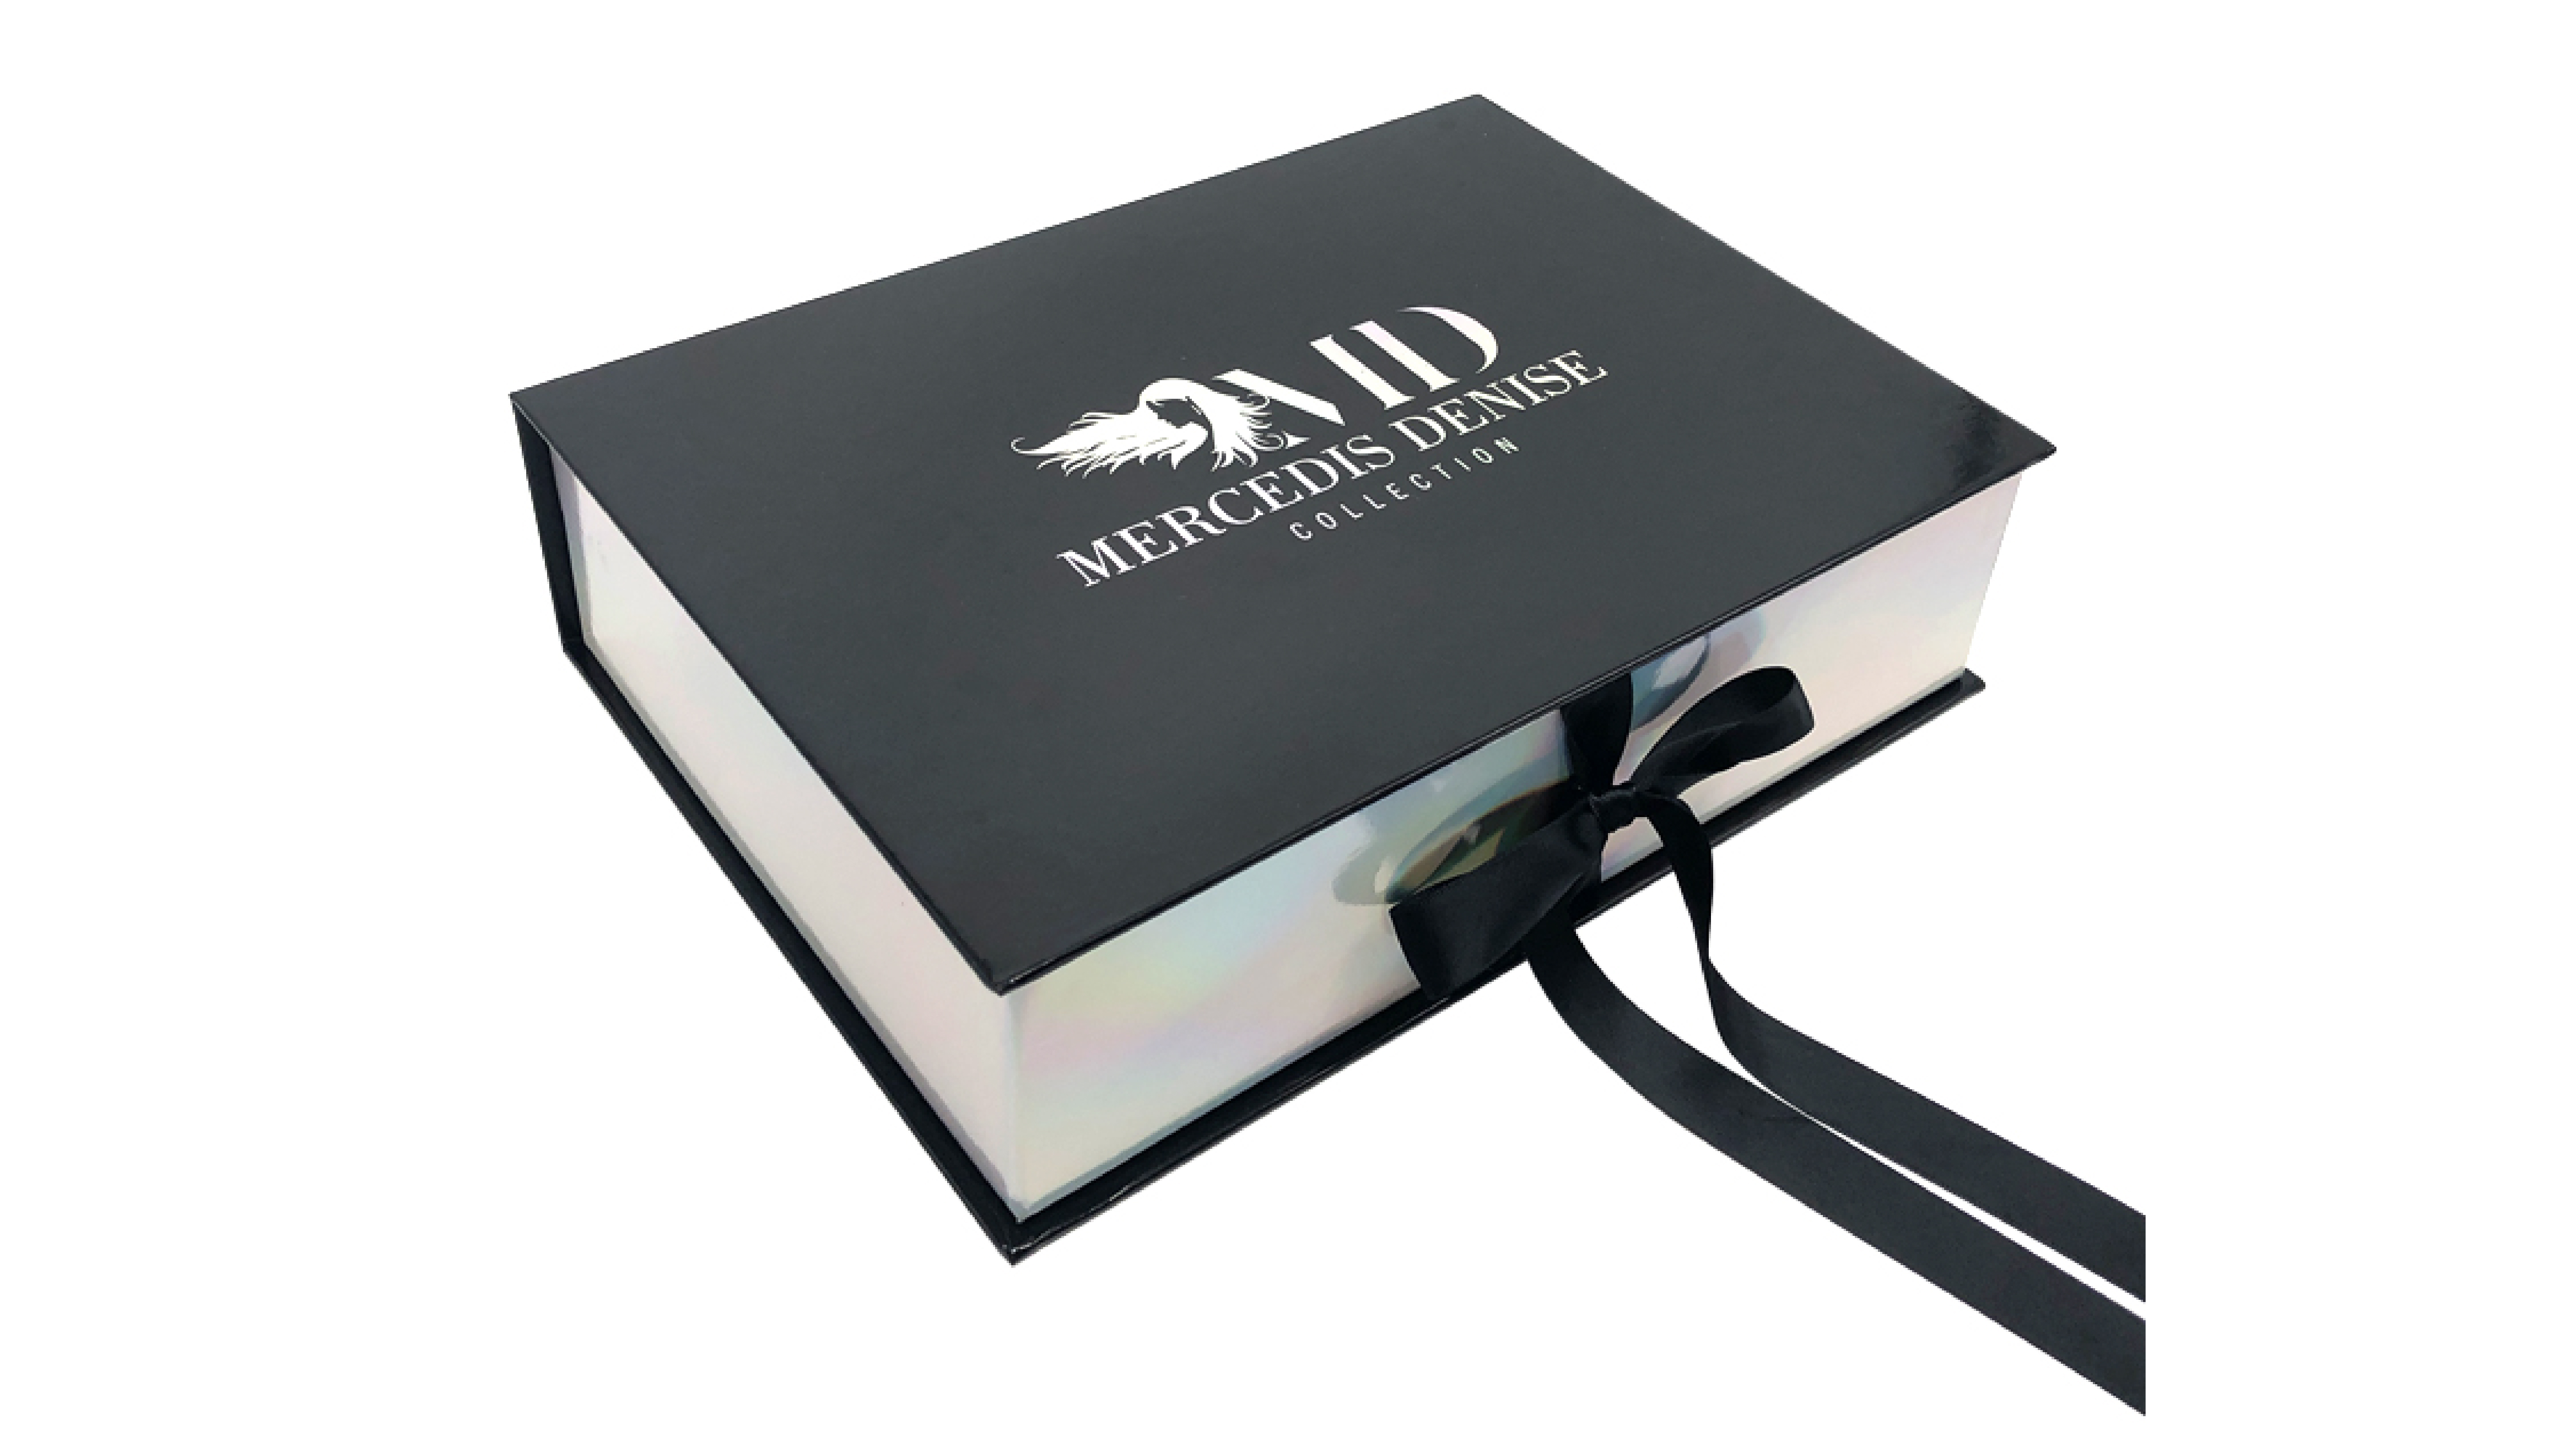 Custom Logo Apparel Underwear Scarf Necktie Gift Cardboard Boxes Clothing Magetic Packaging Box